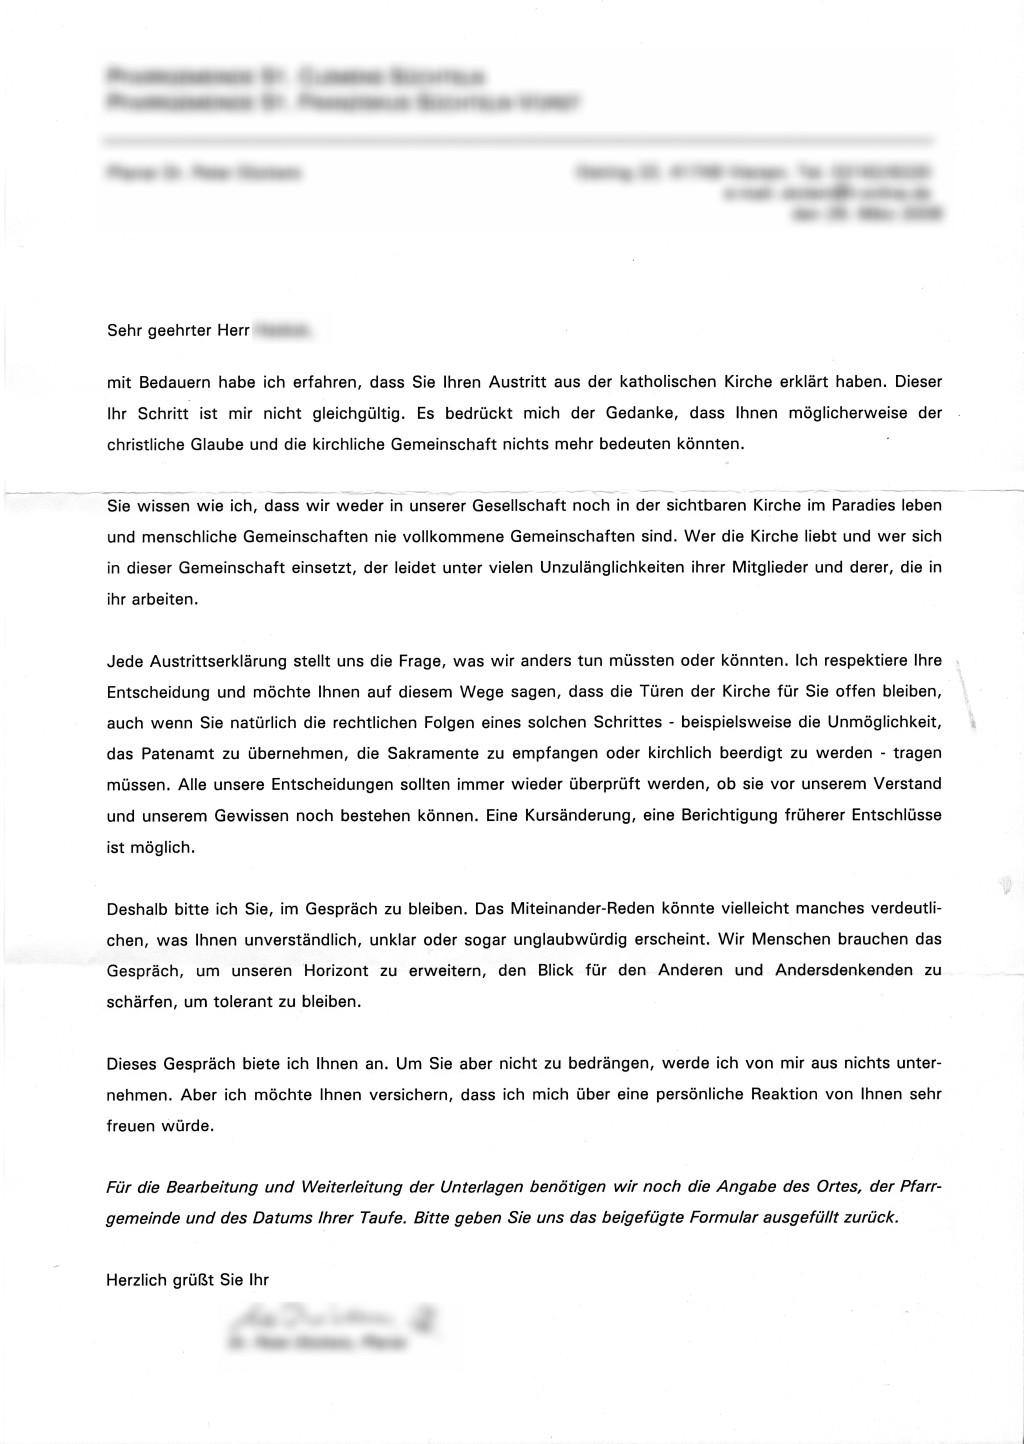 kirchenaustritt steuermäßig [Archiv] - 3DCenter Forum